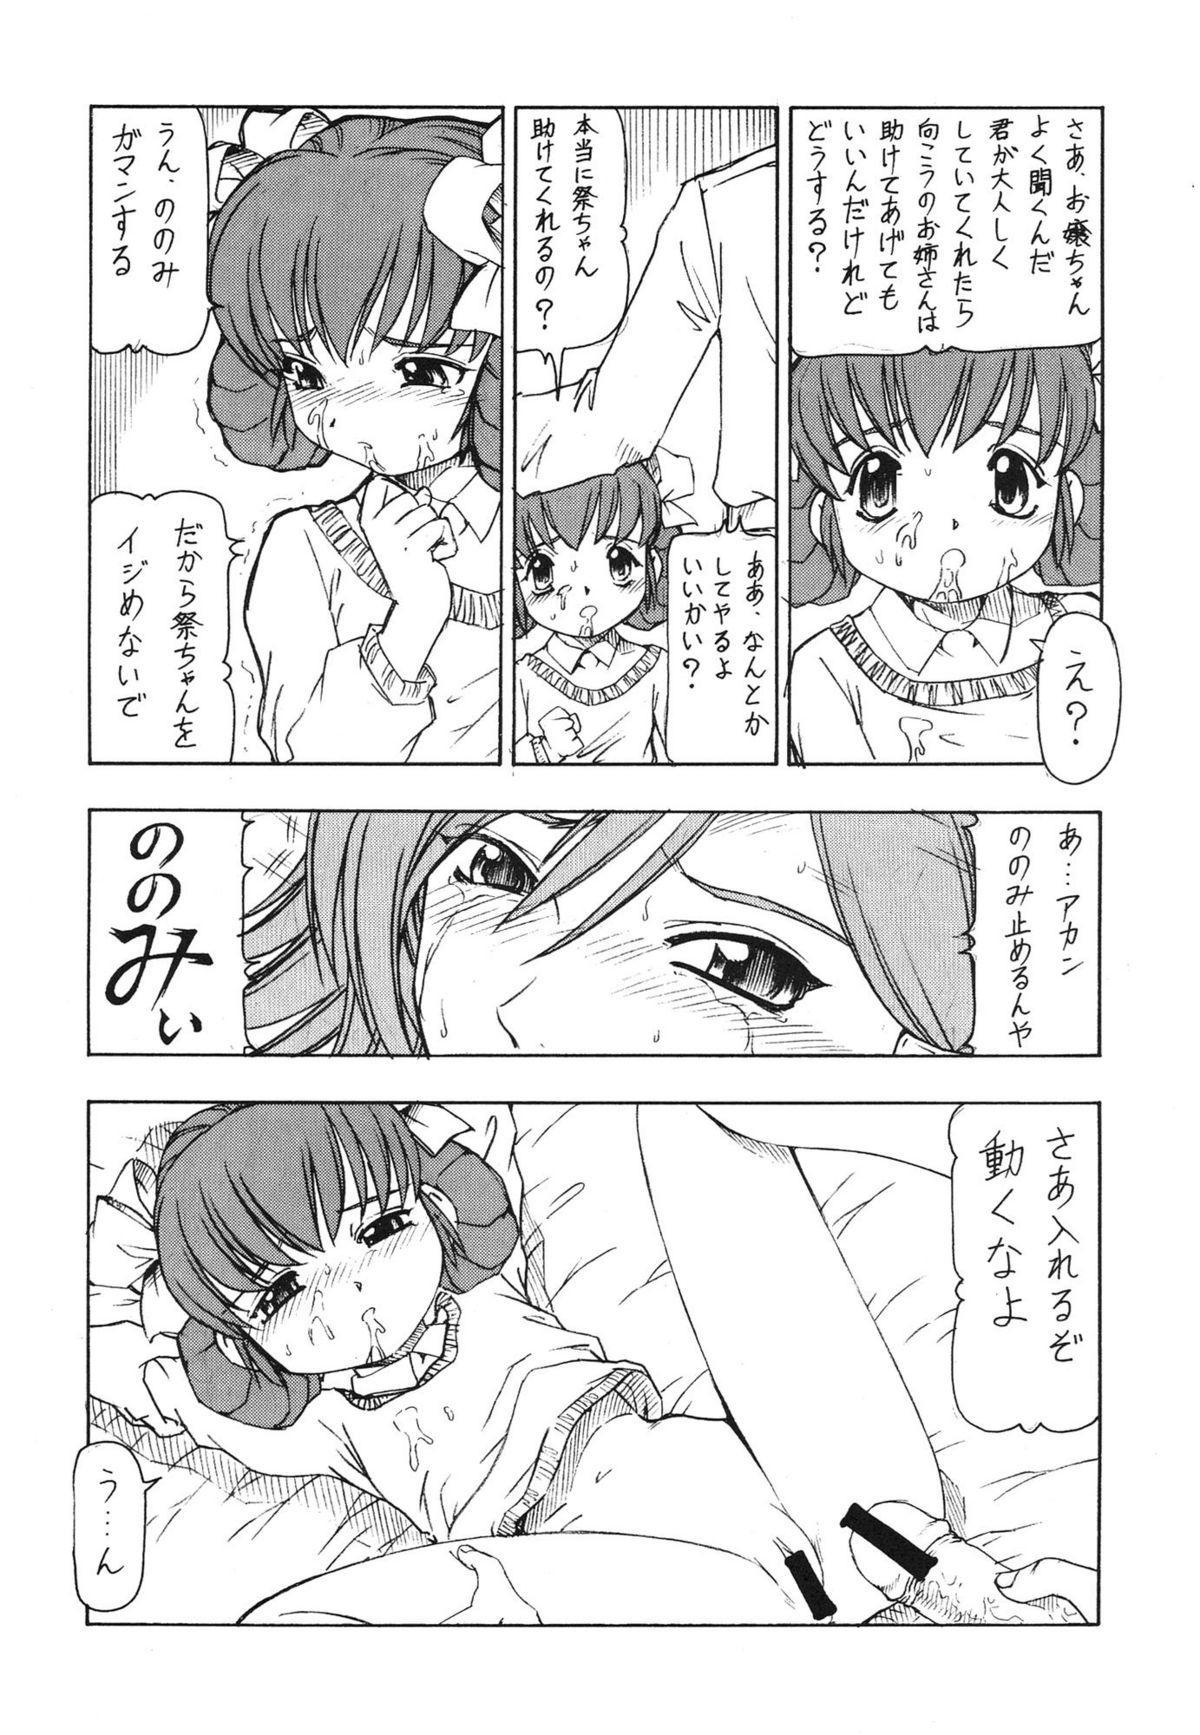 GPM.XXX Animation Moegiiro no Namida - Tear Drops 37